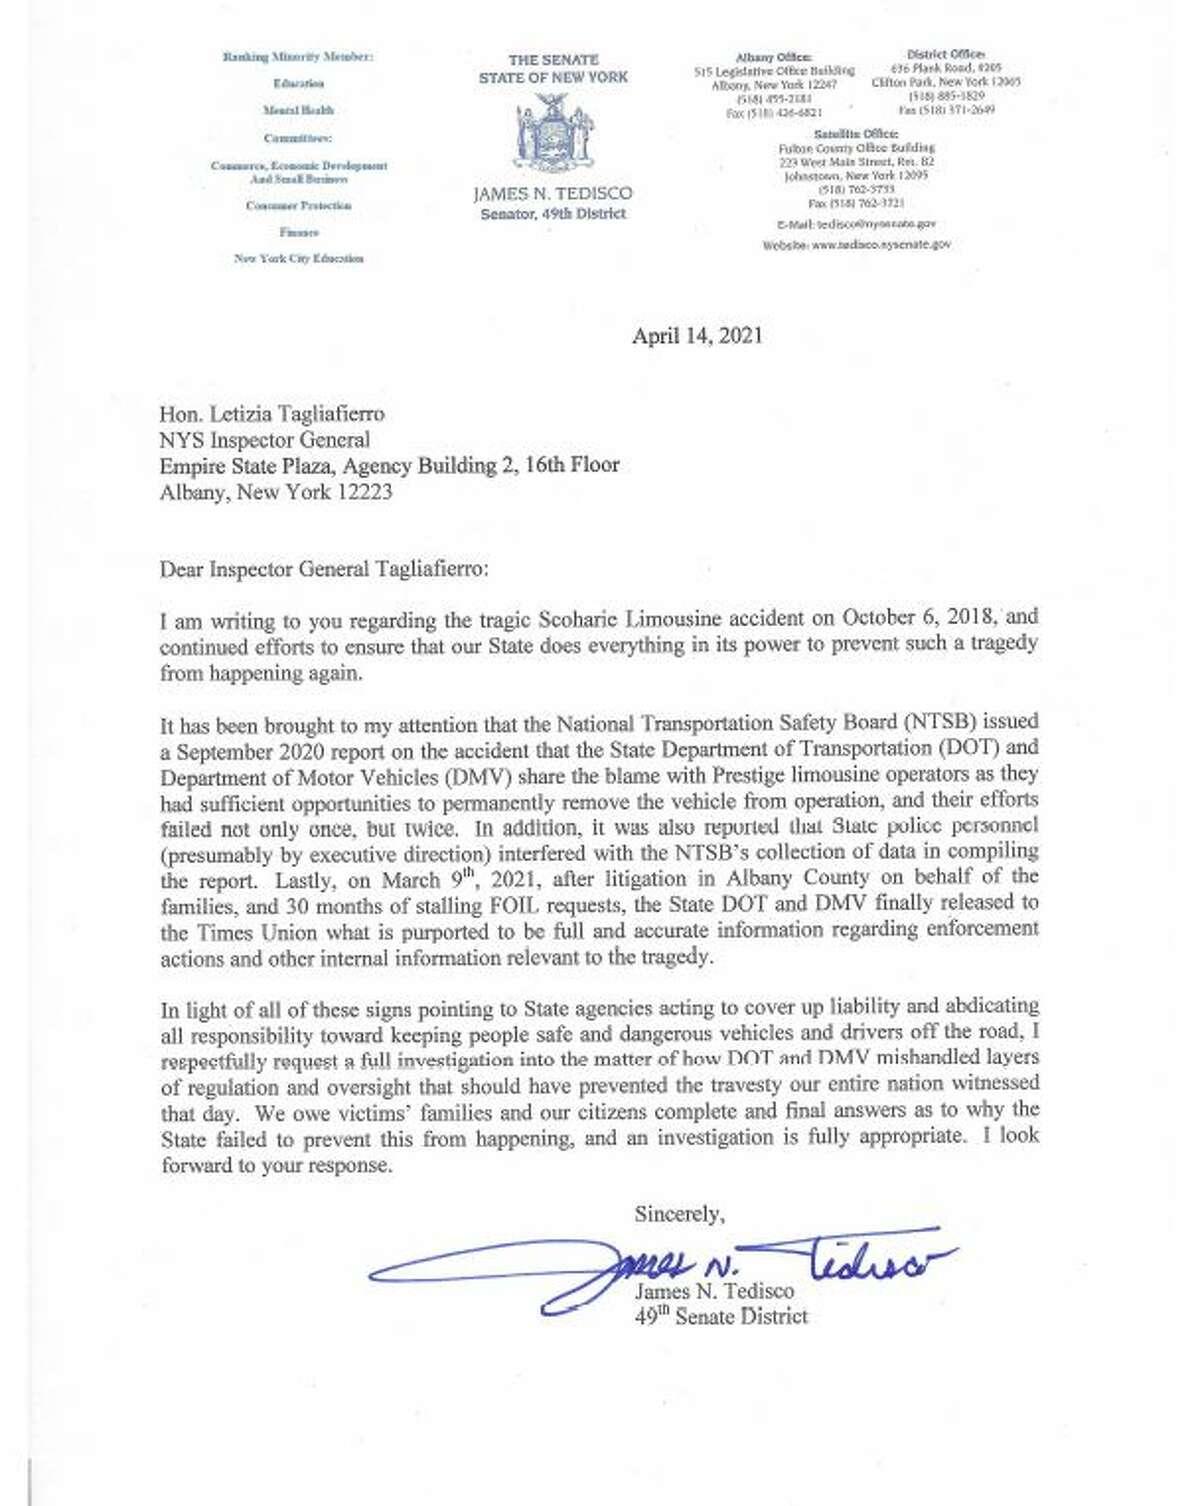 A letter written by state Sen. James Tedisco to Investigator General Letizia Tagliafierro regarding the 2018 limousine crash in Schoharie